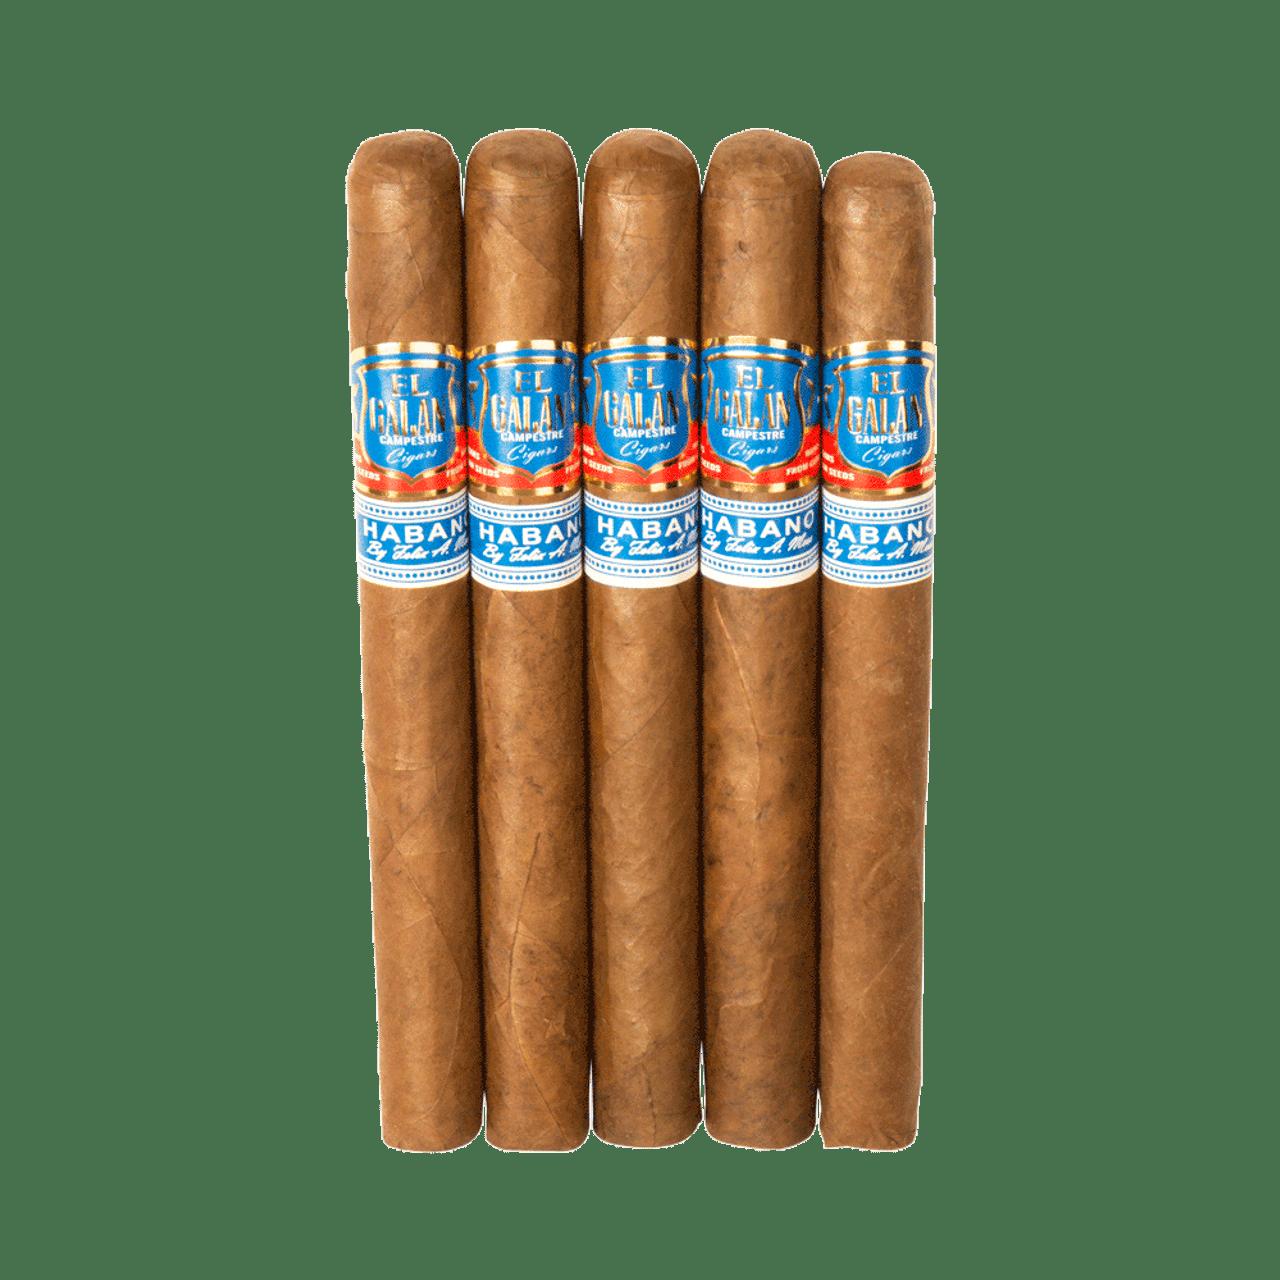 El Galan Campestre Churchill Cigars - 7 x 48 (Pack of 5)